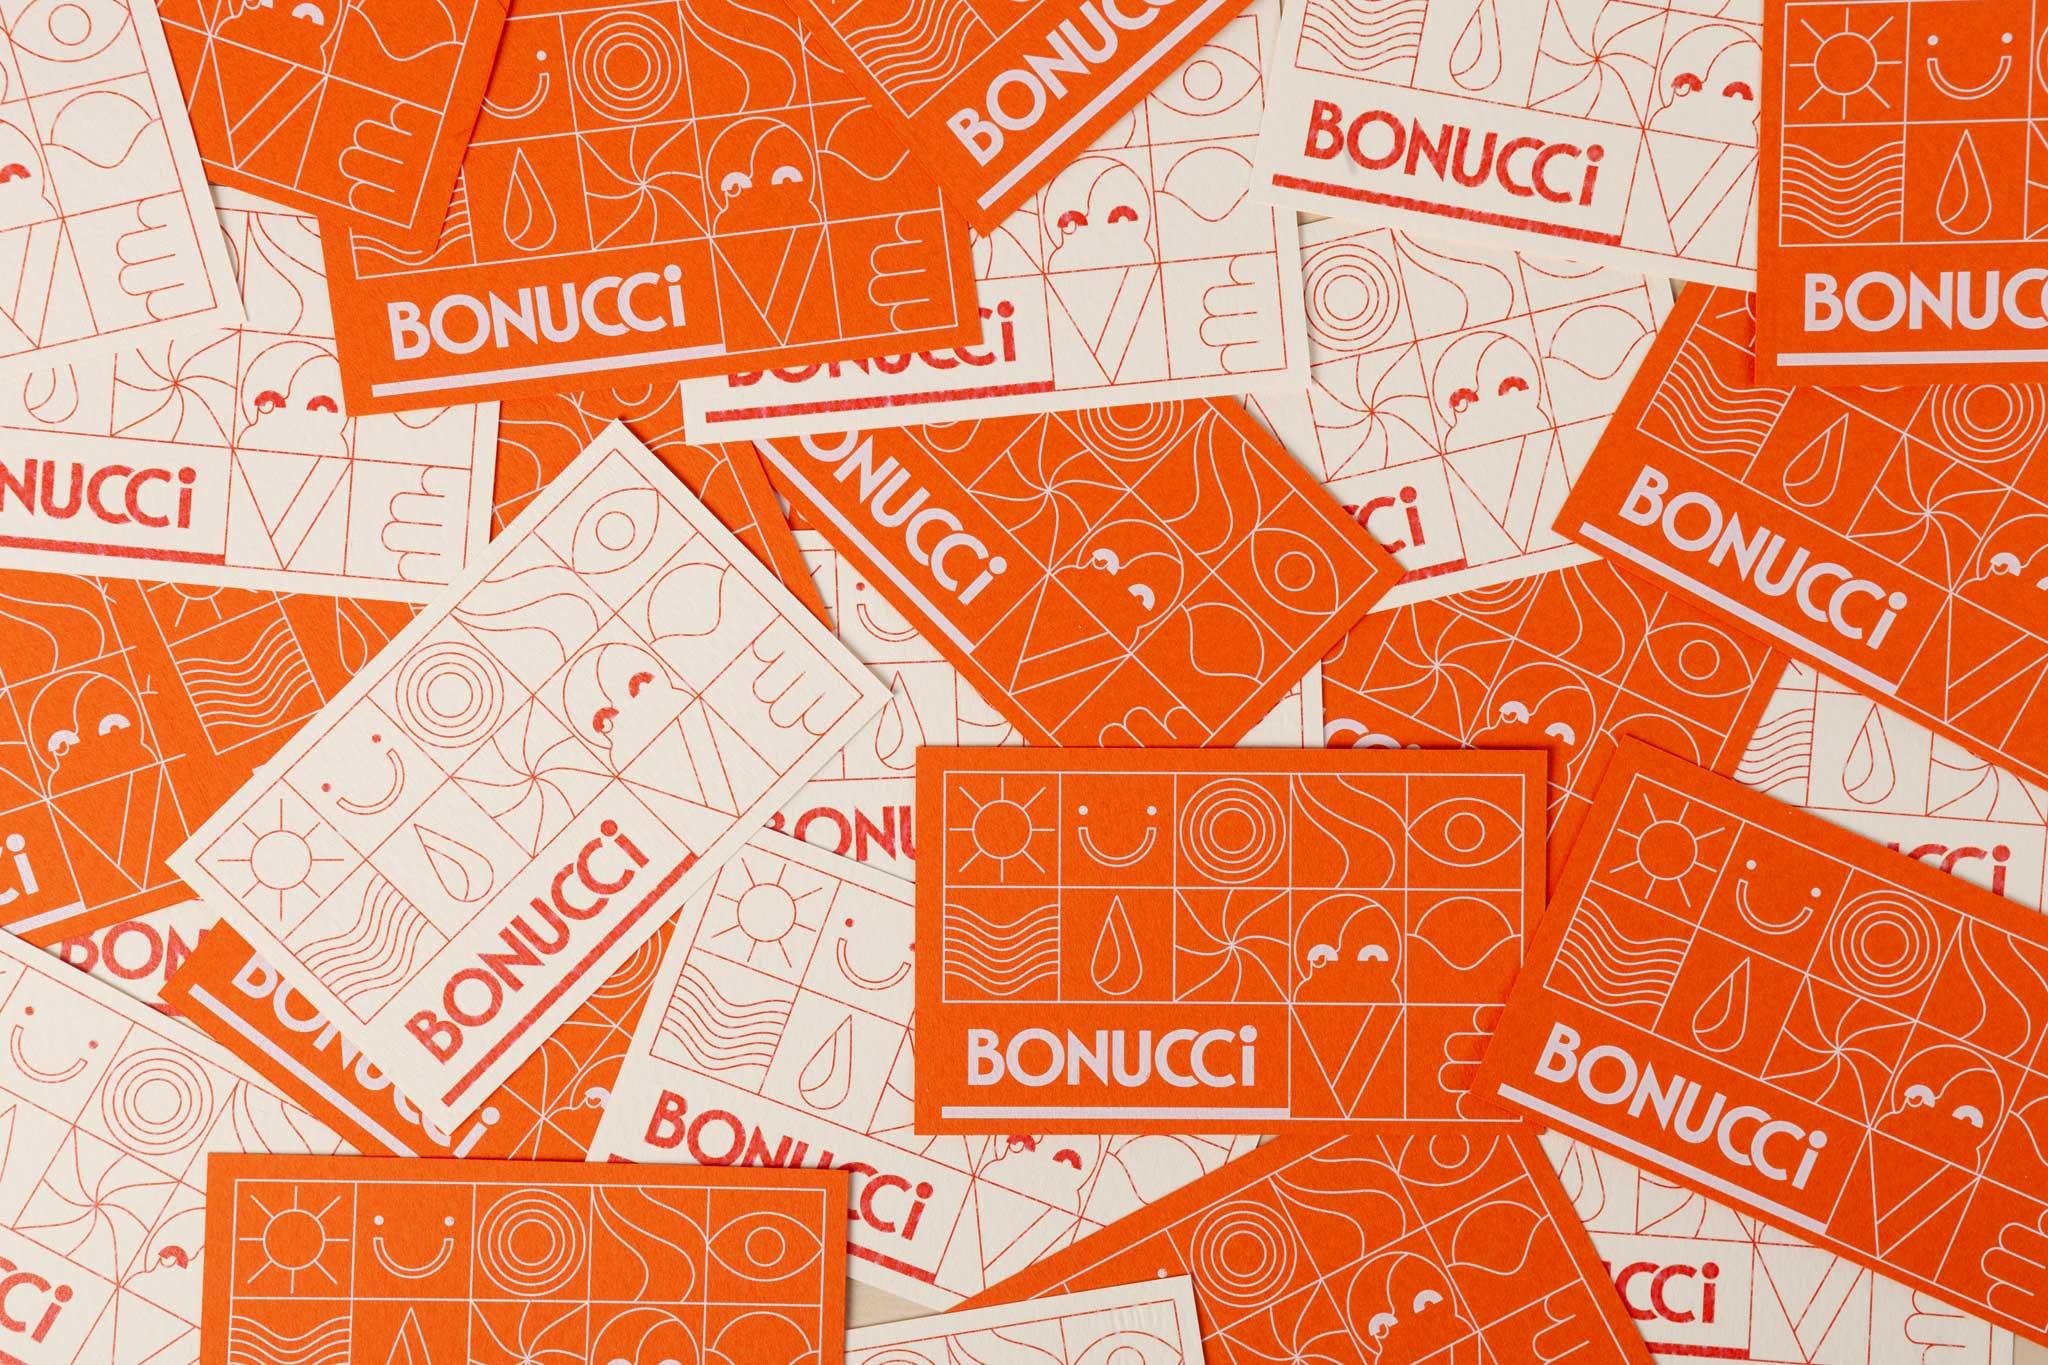 Bonucci_Gelats©arbol